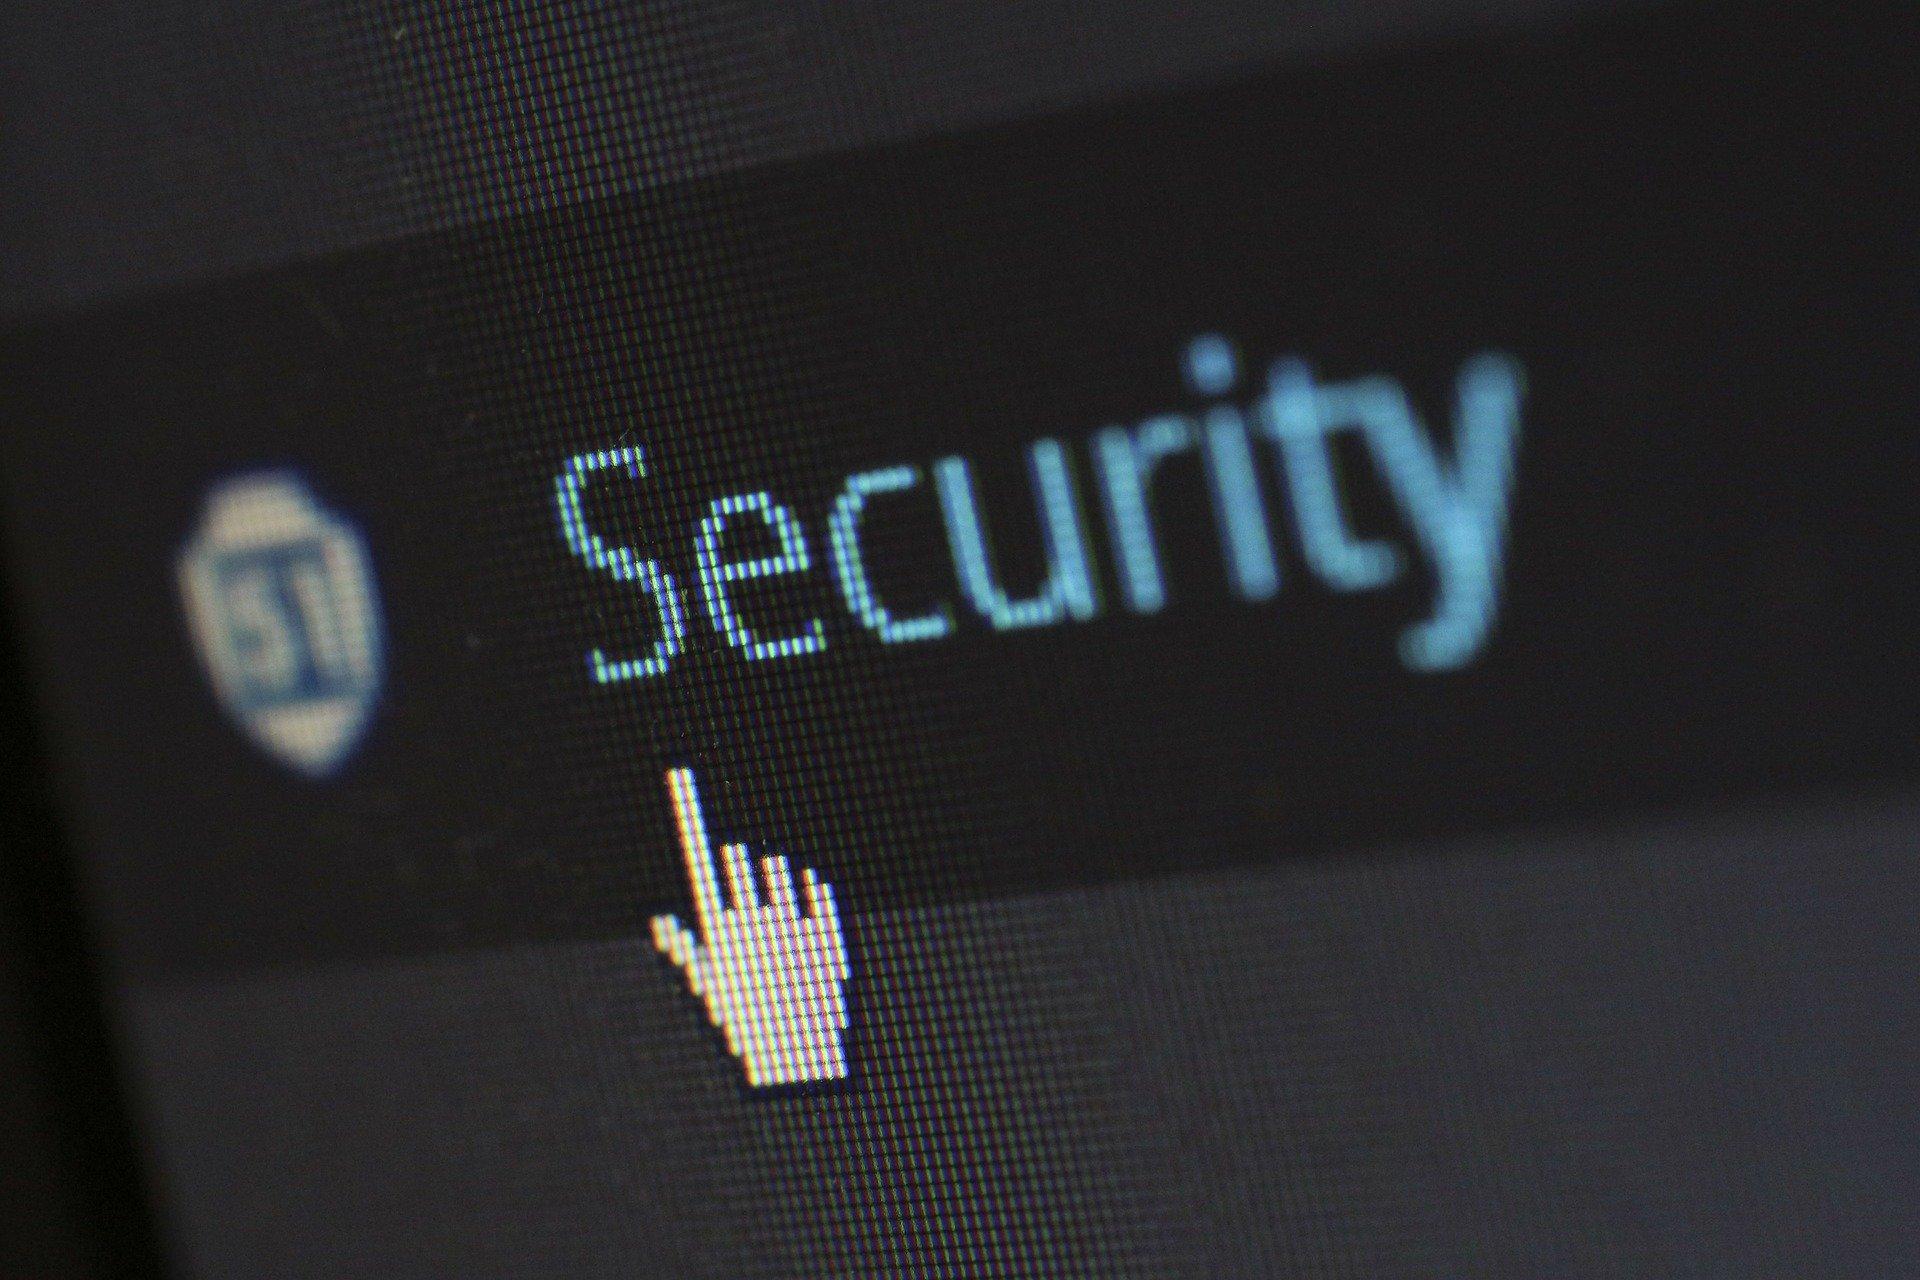 informática; ataque; hacker; tecnologia